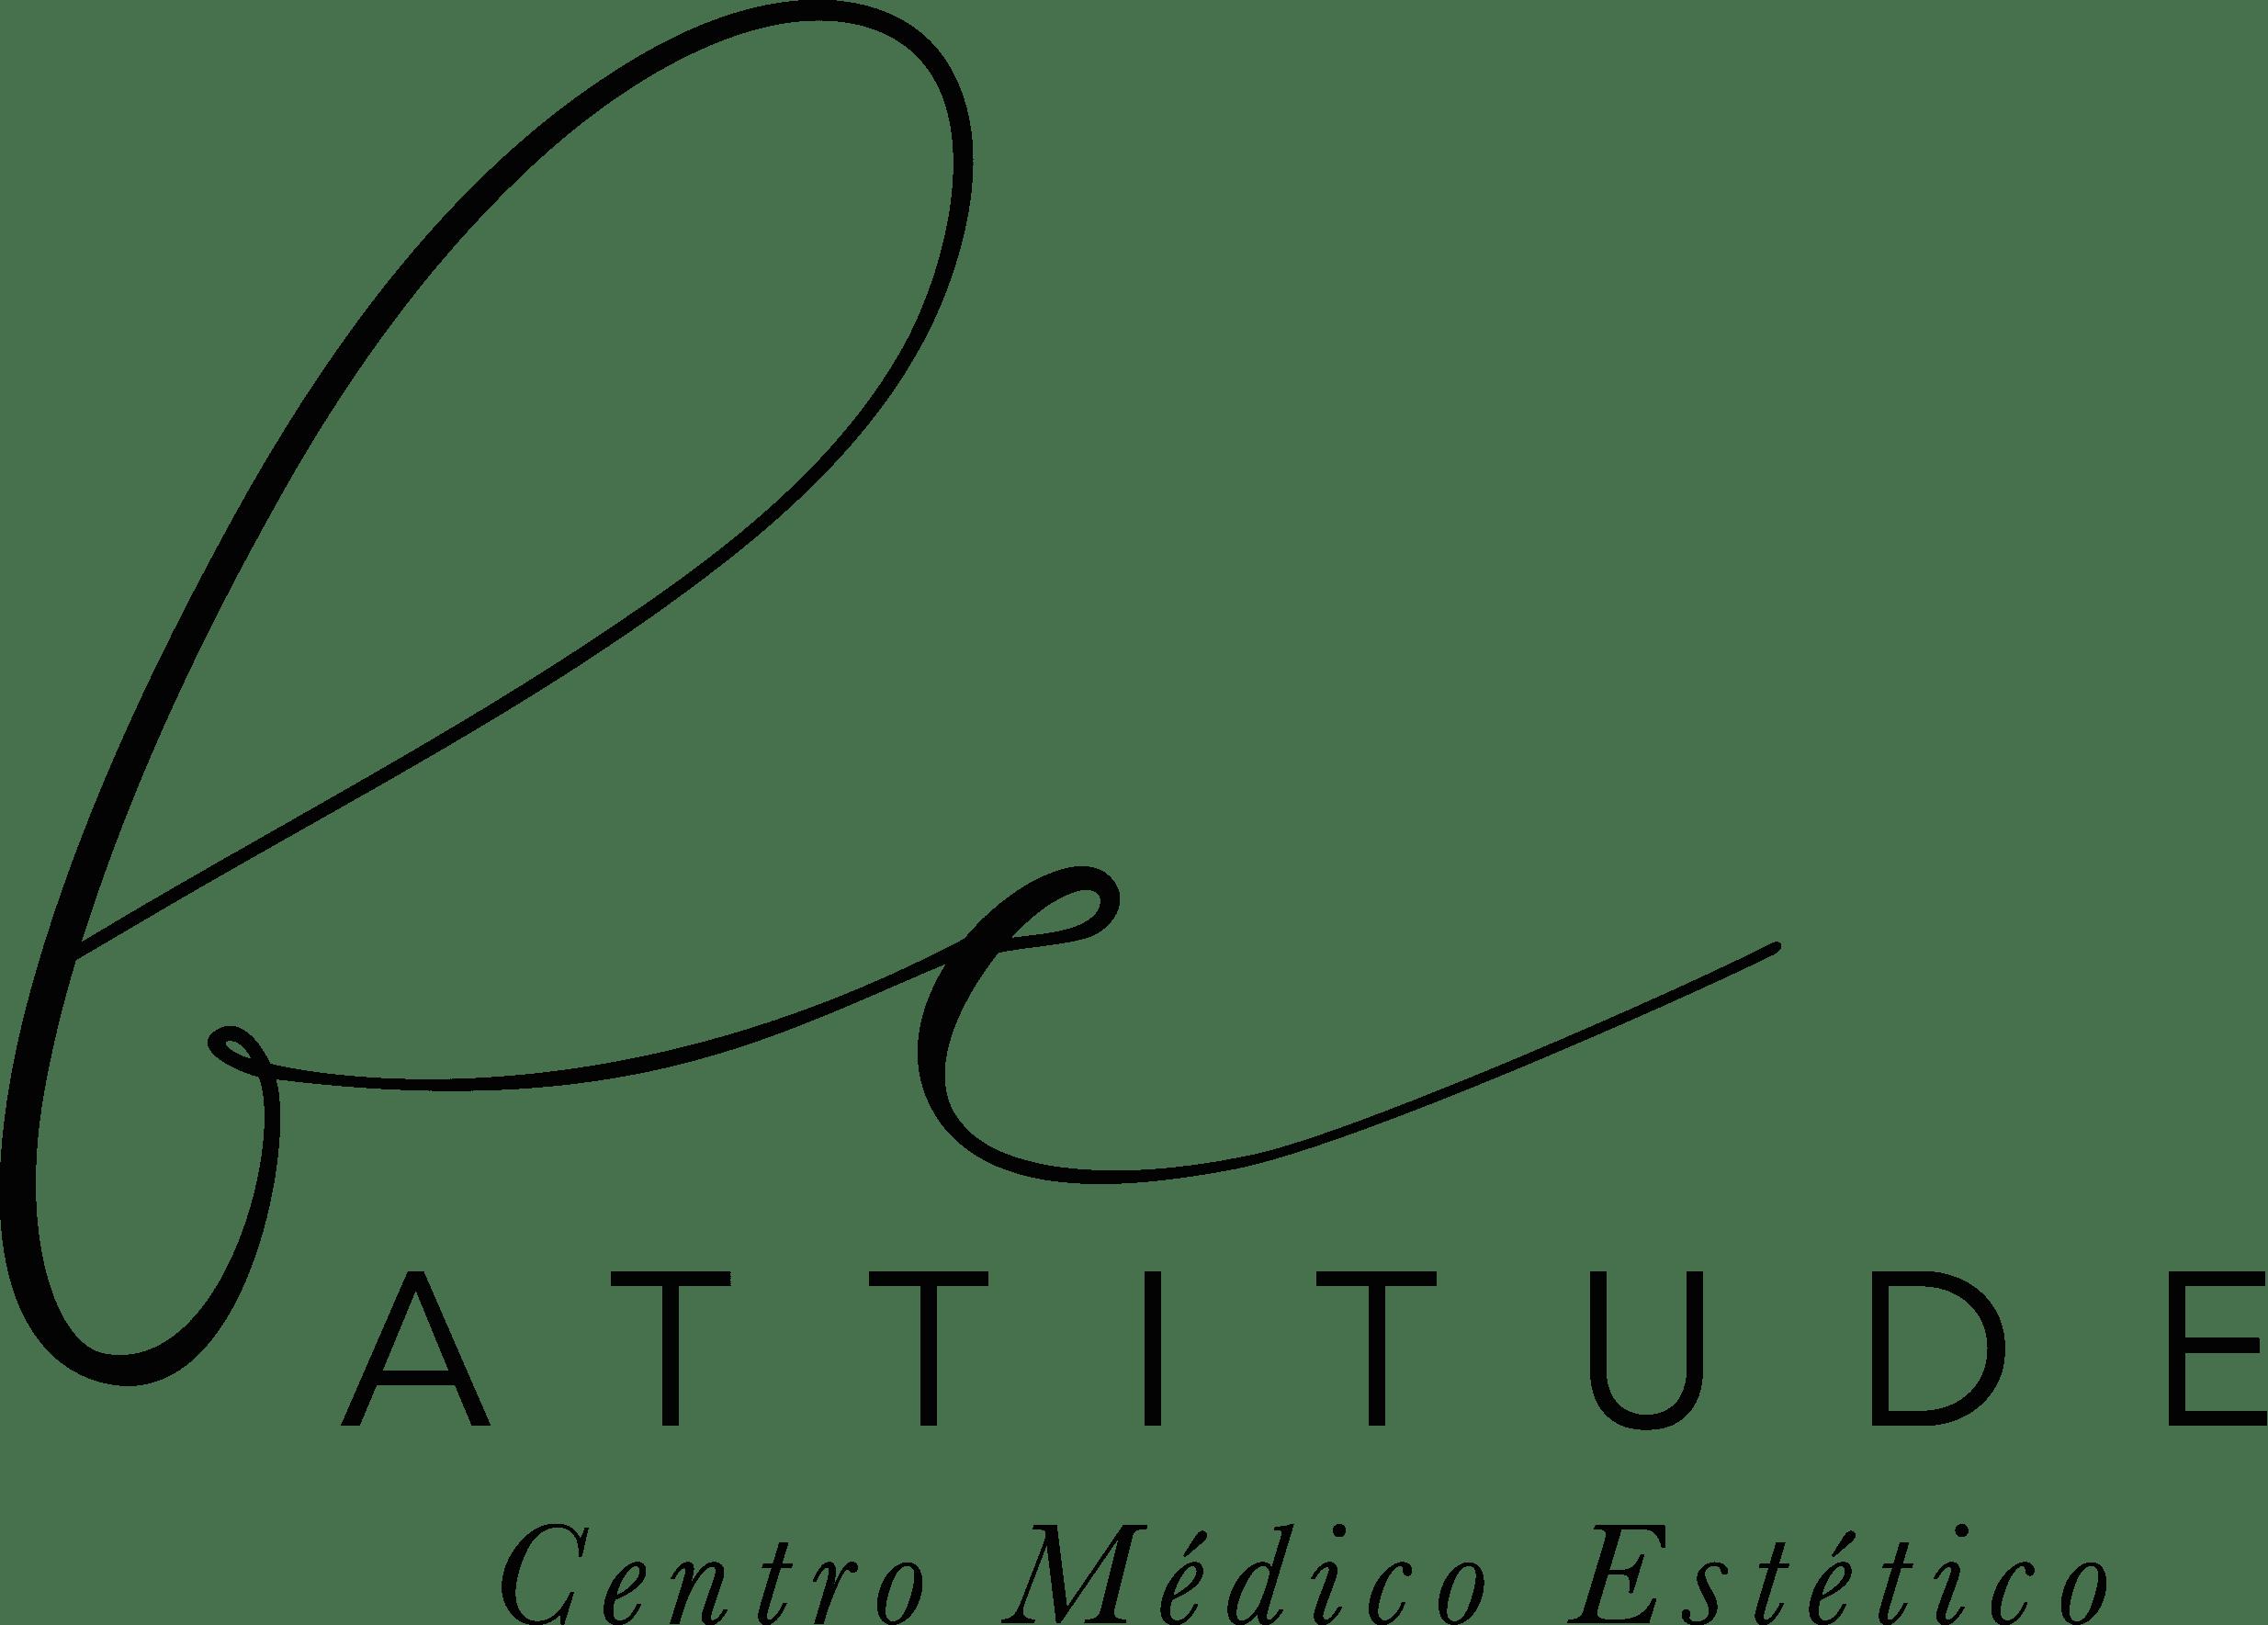 Centro Be Attitude